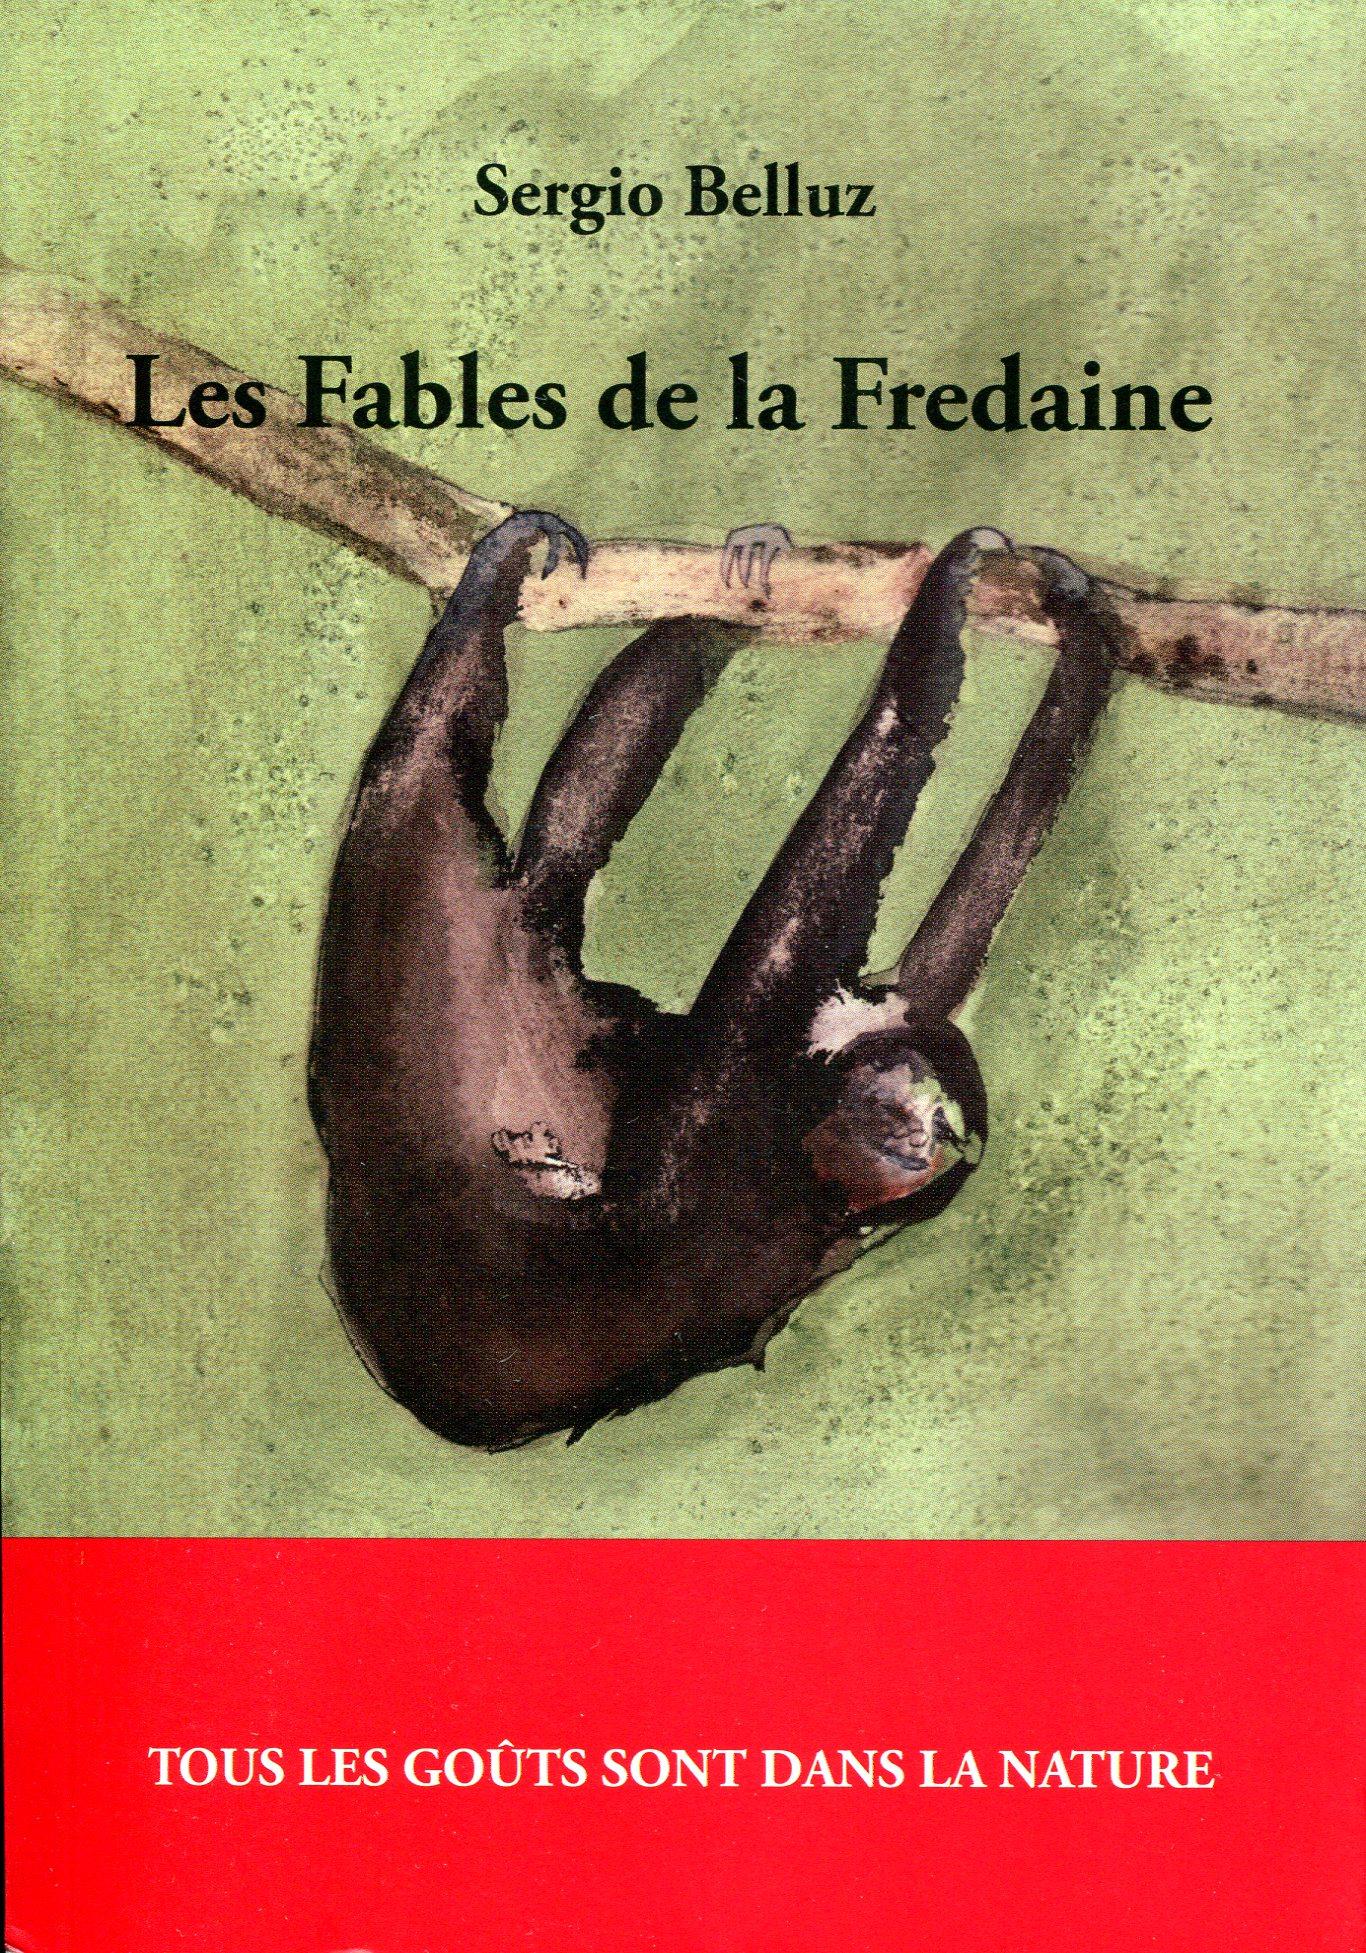 2016 08 05 Sergio Belluz Fables de la Fredaine.jpg